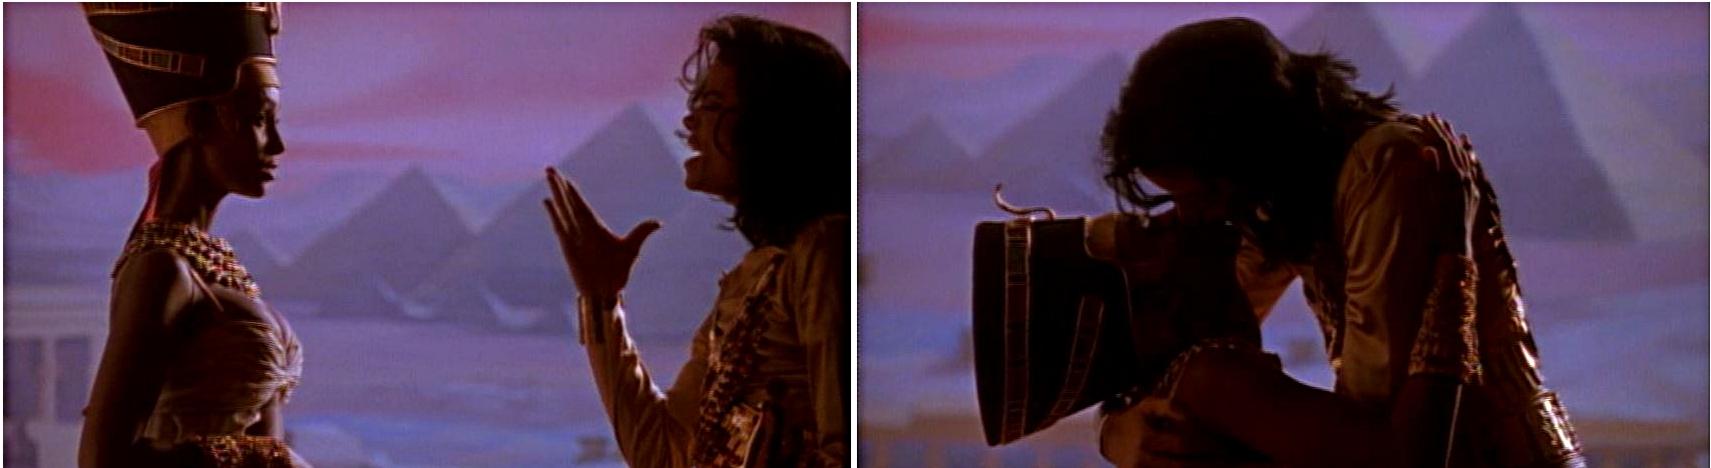 michael jackson dangerous album cover explained meaning erklärt symbols symbole bedeutung ryden art remember the time kiss egypt ägypten pharao queen